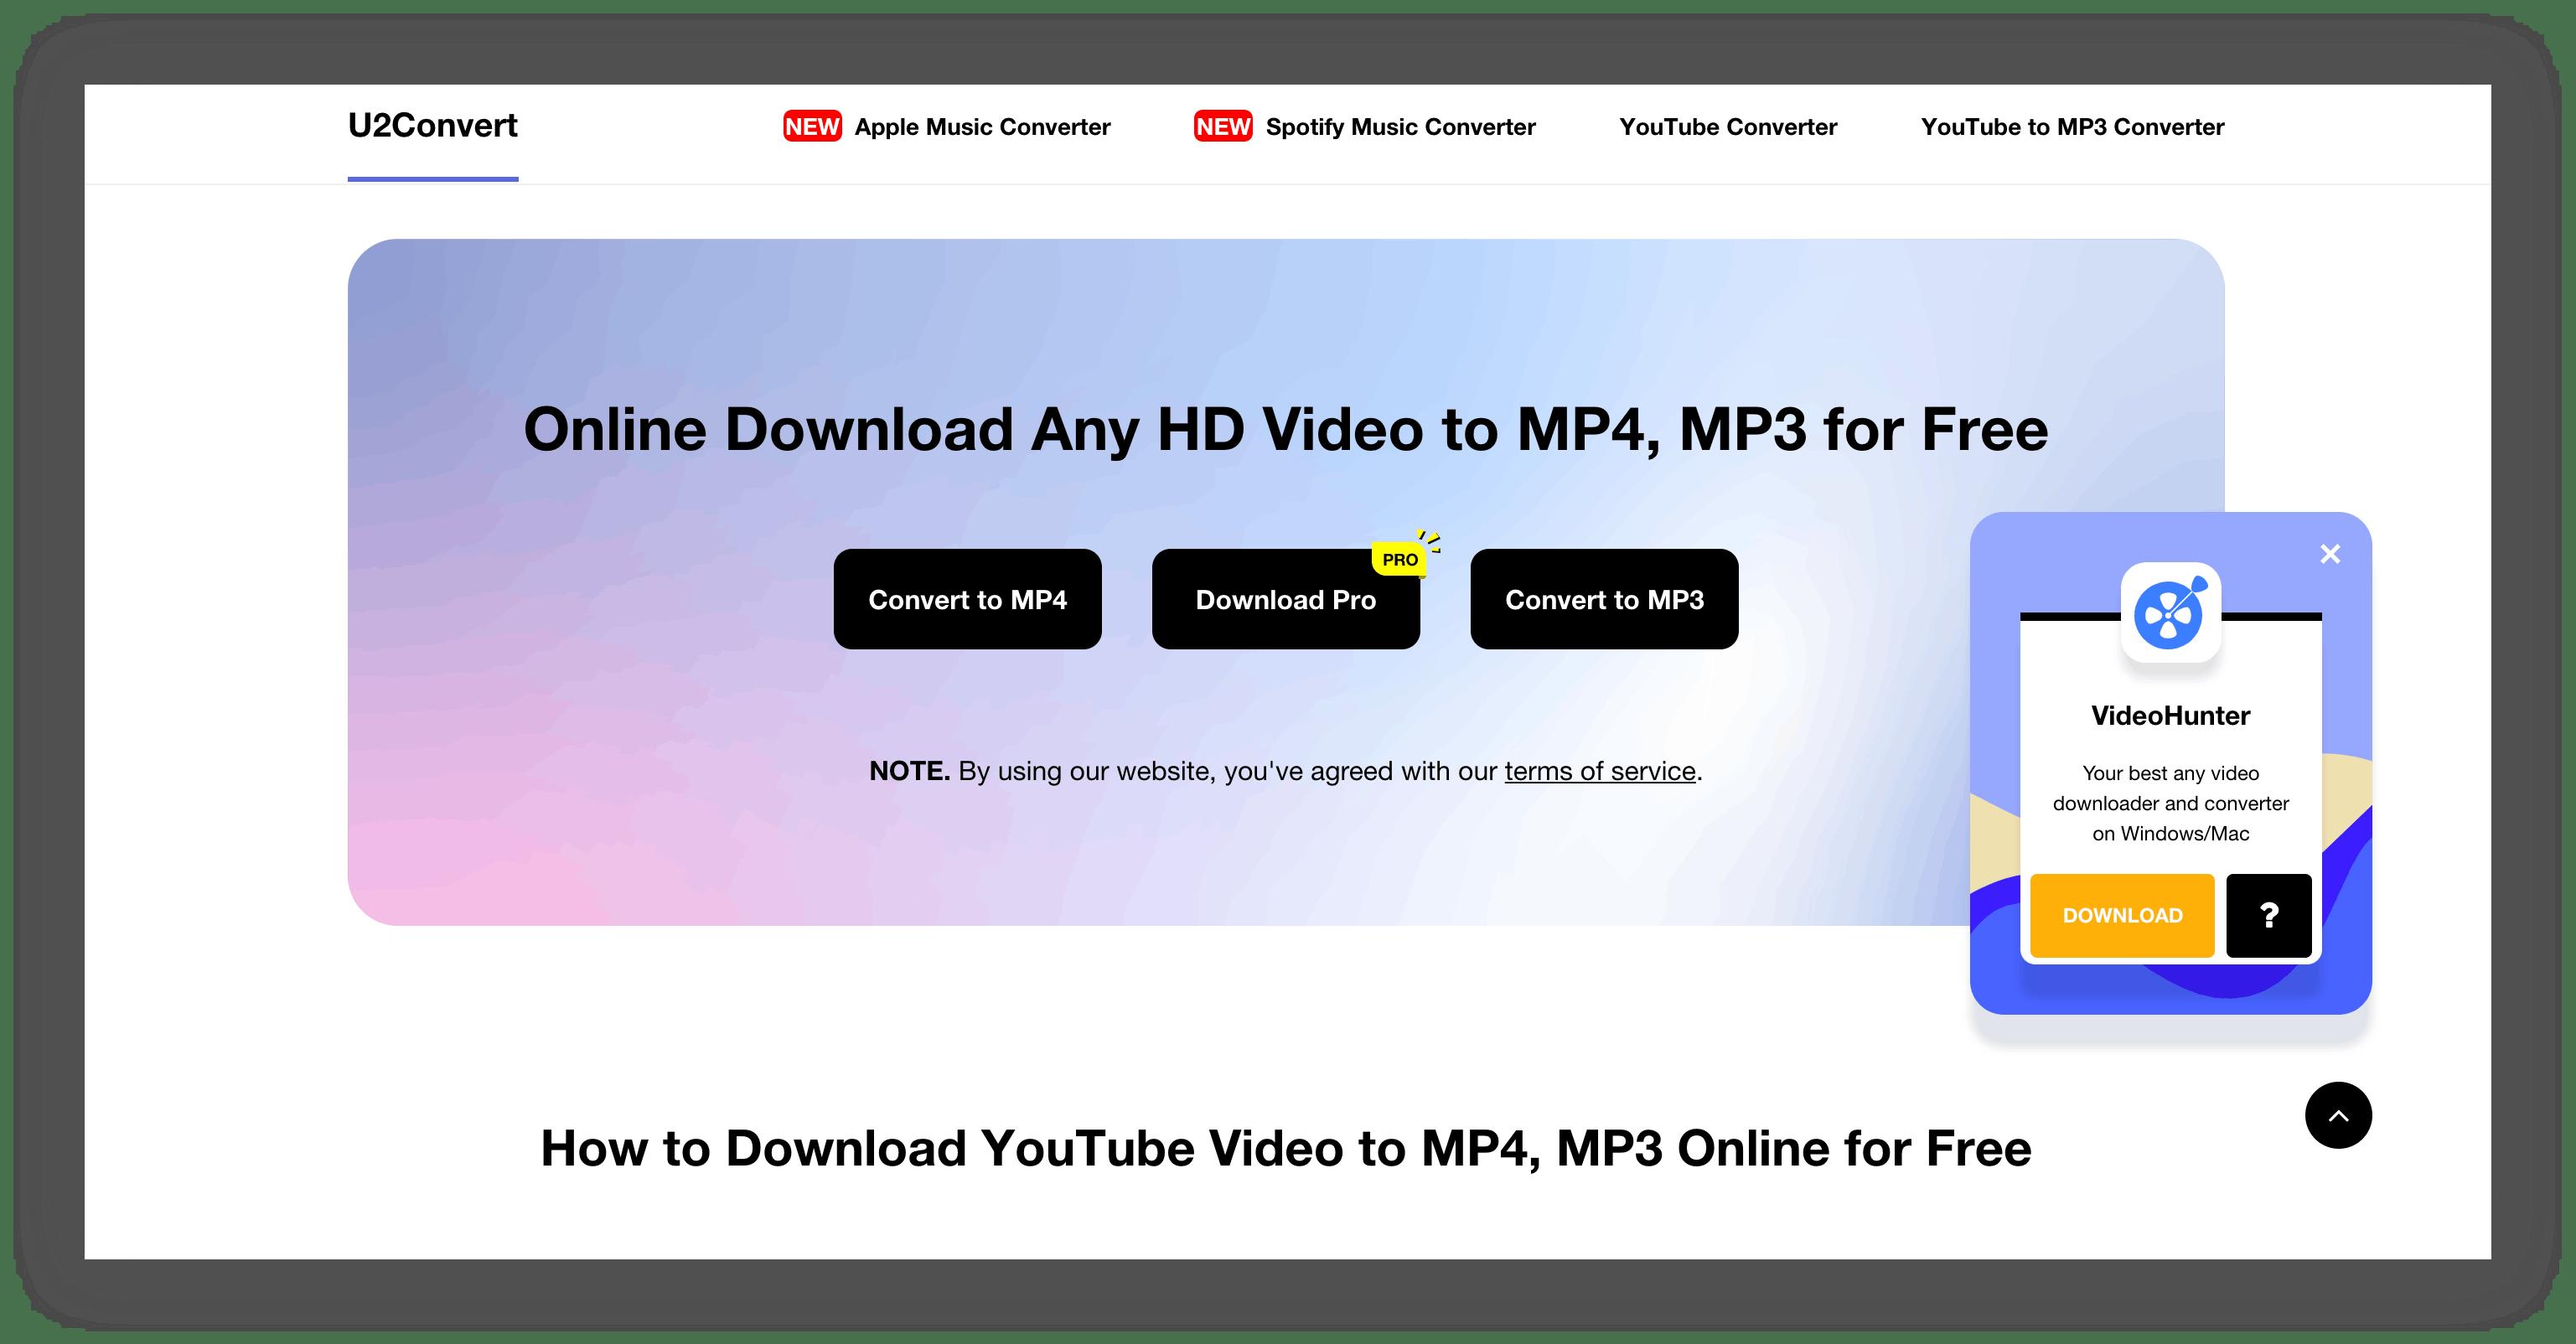 u2convert homepage